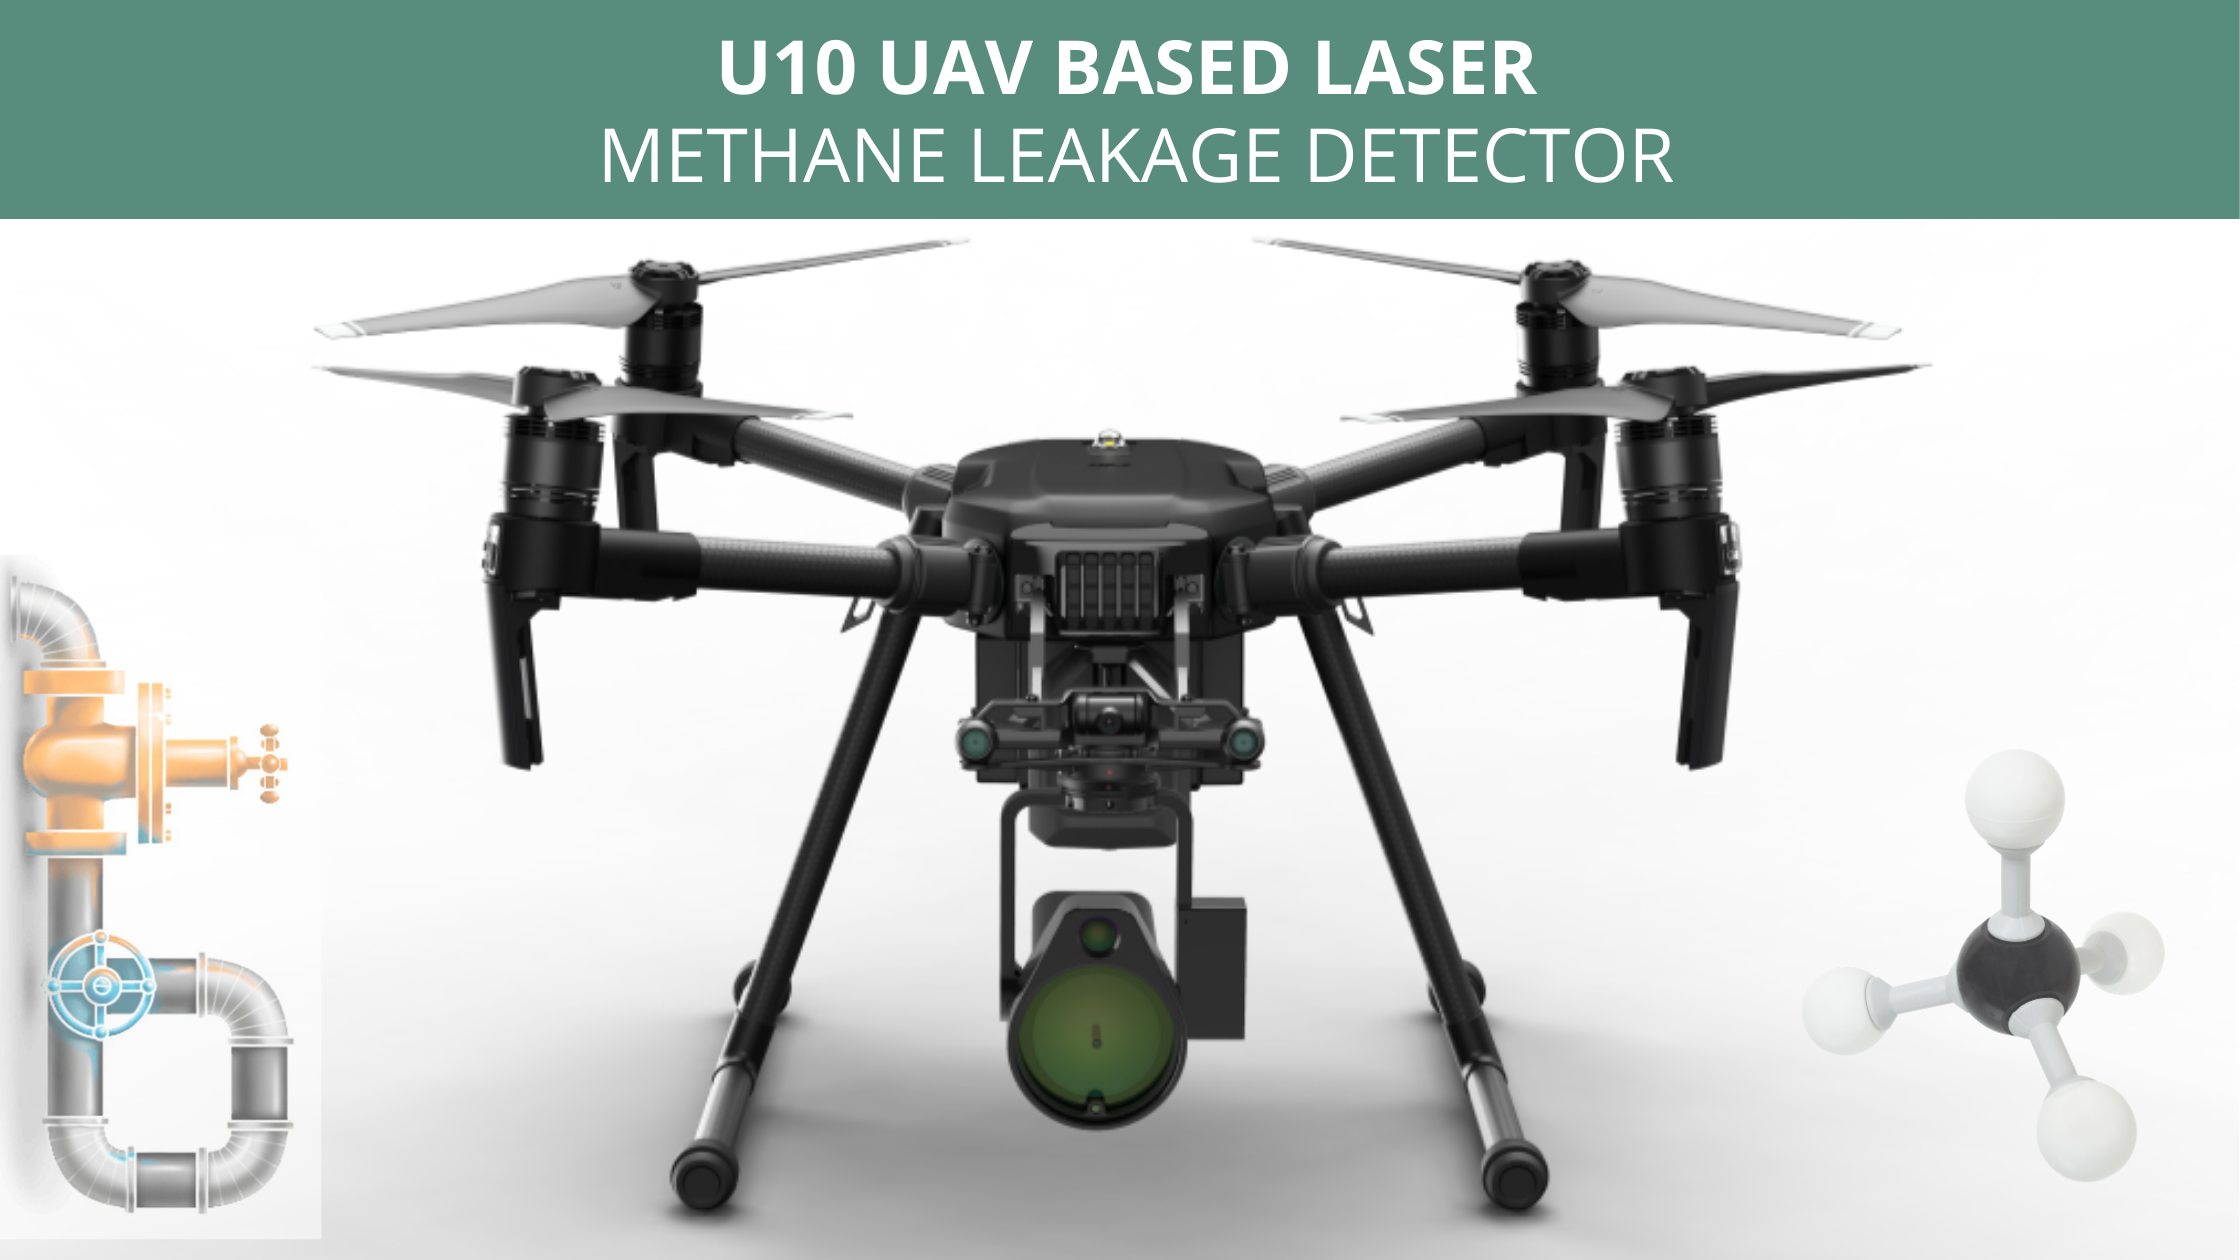 U10 UAV Based Laser Methane Leakage Detector